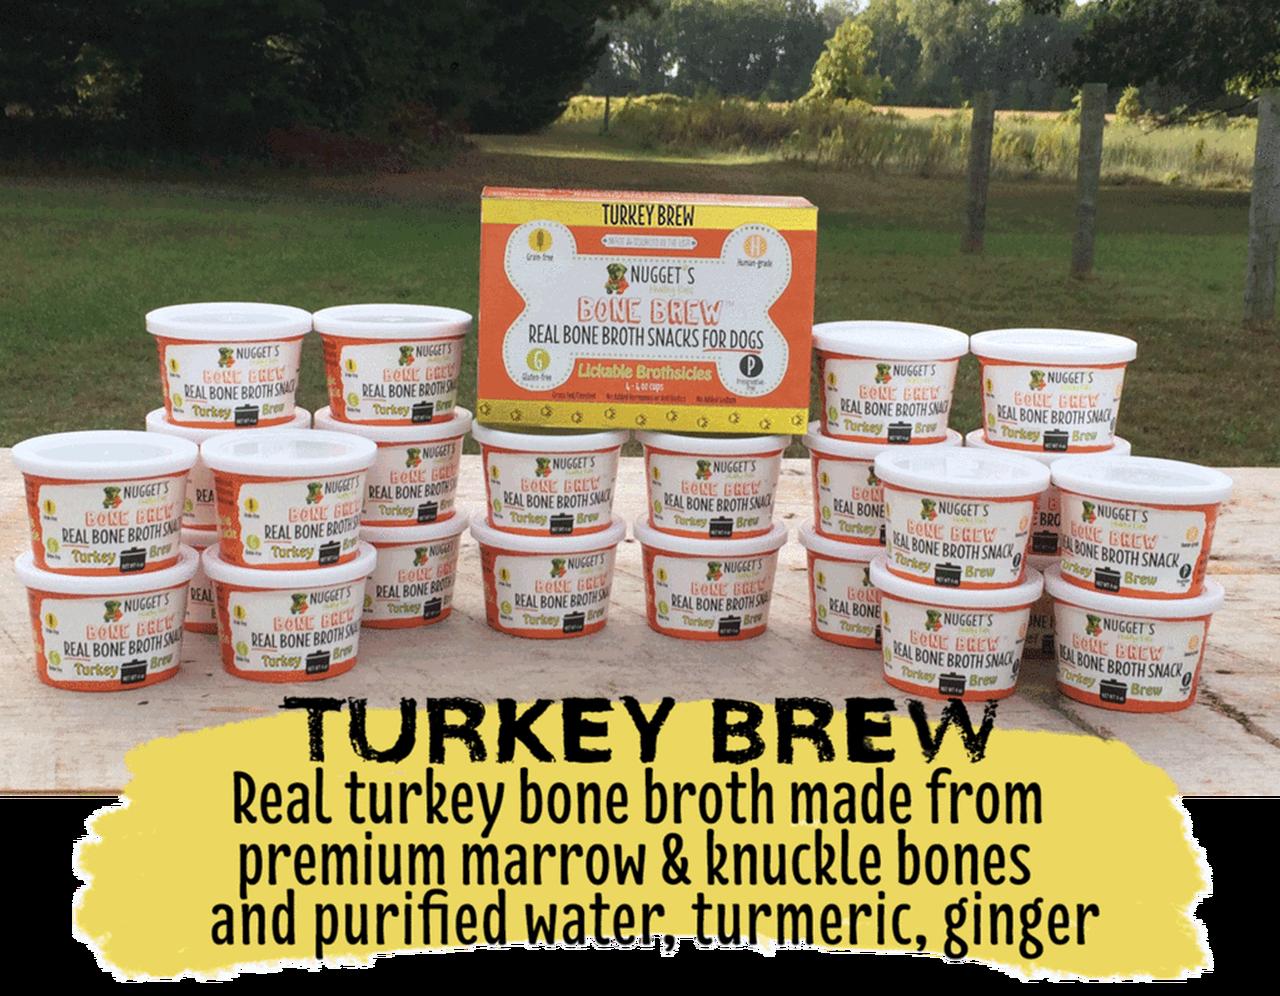 Nugget's Healthy Eats Turkey Bone Broth Dog Treats, 4-oz, 4-pk